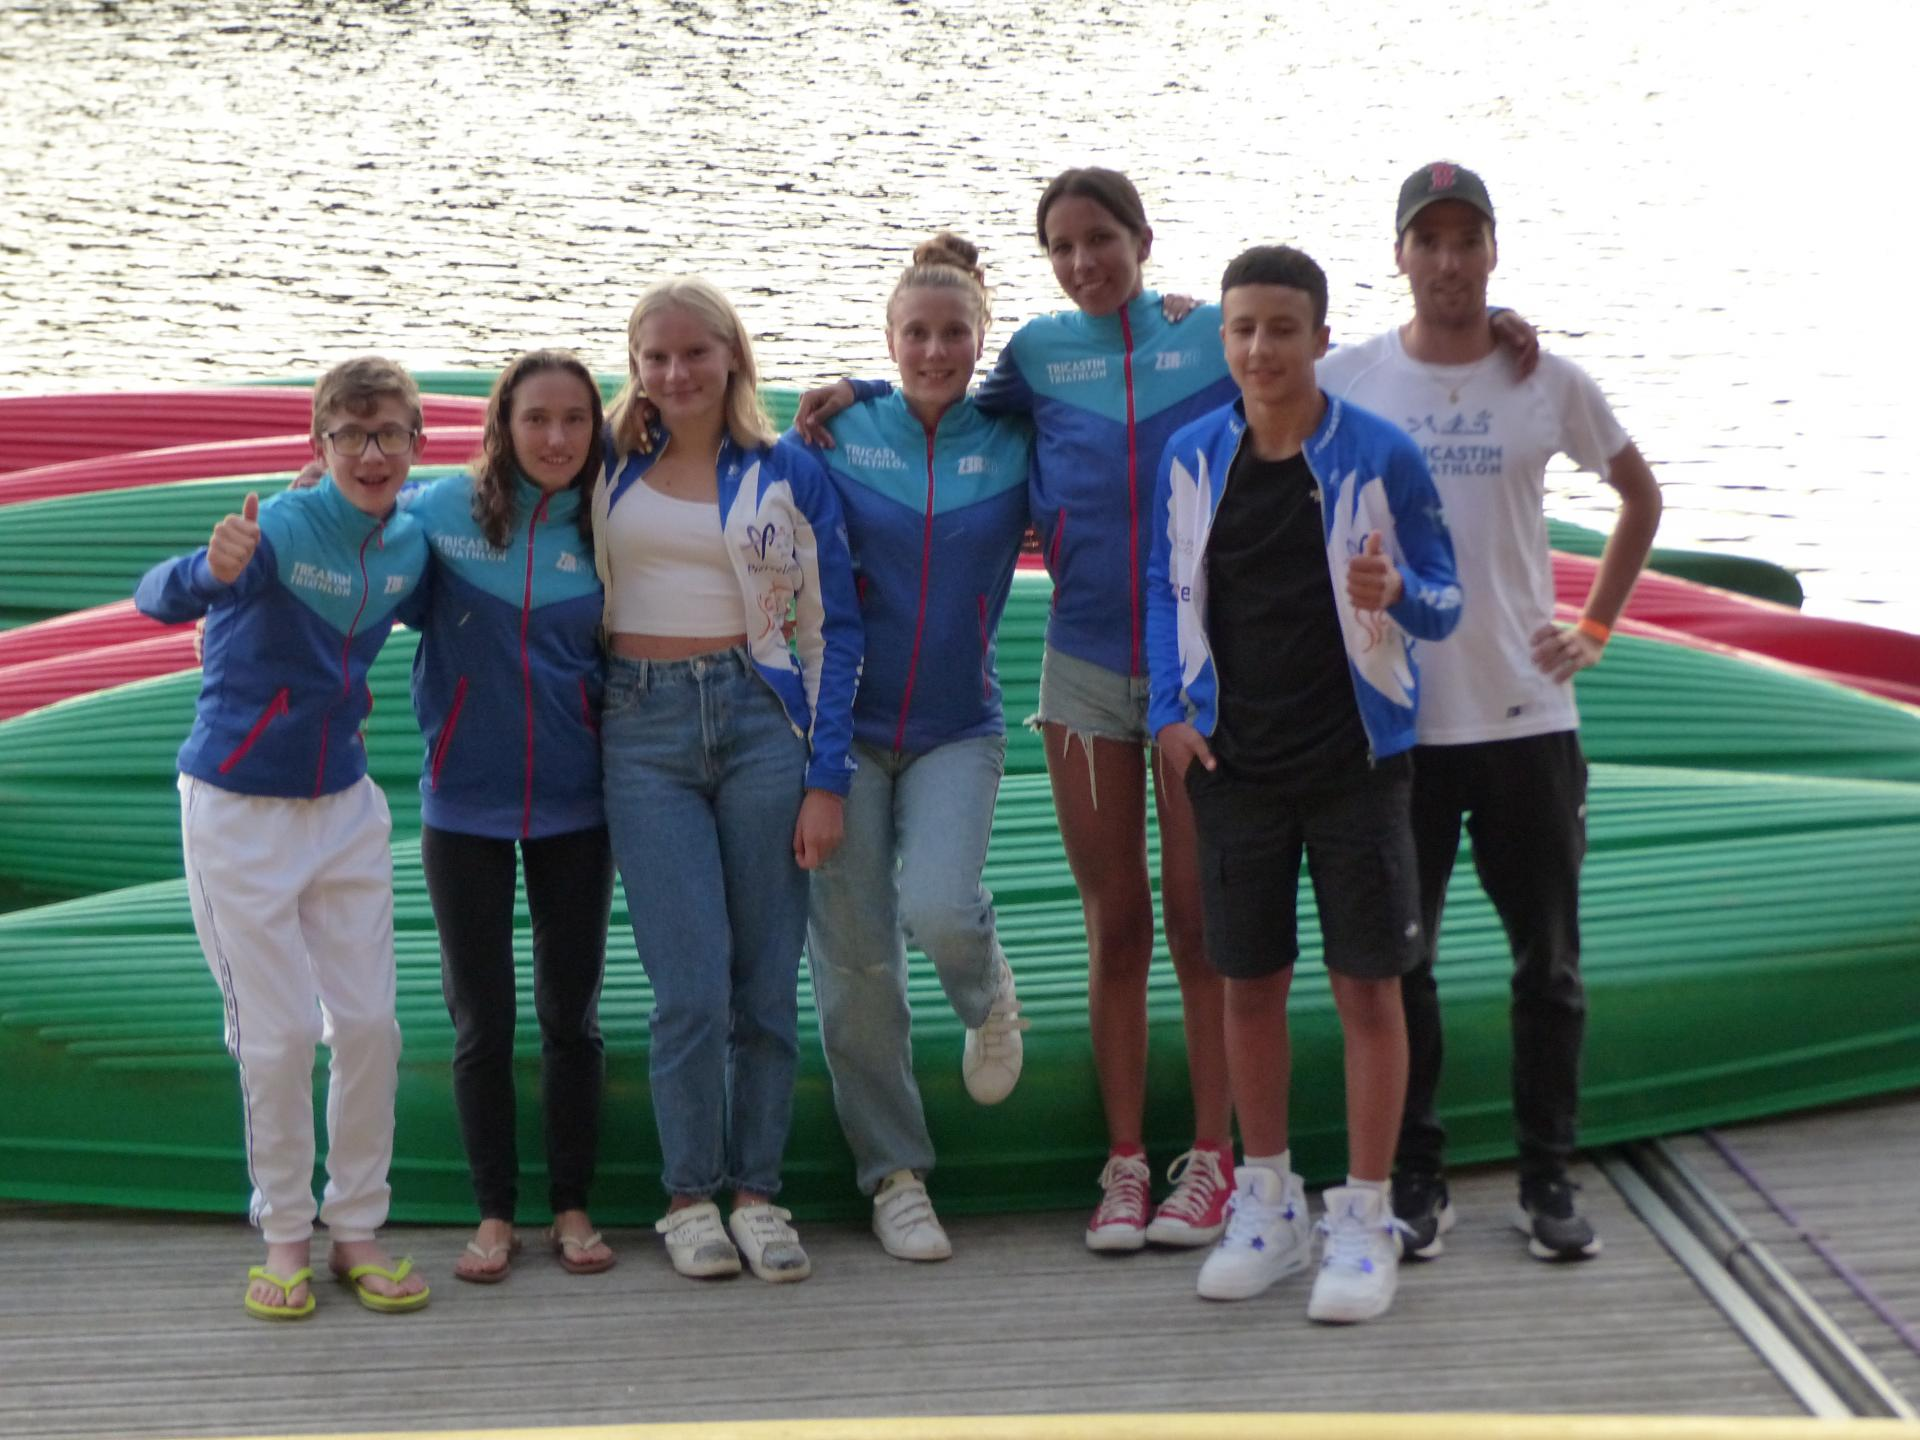 France aquathlon